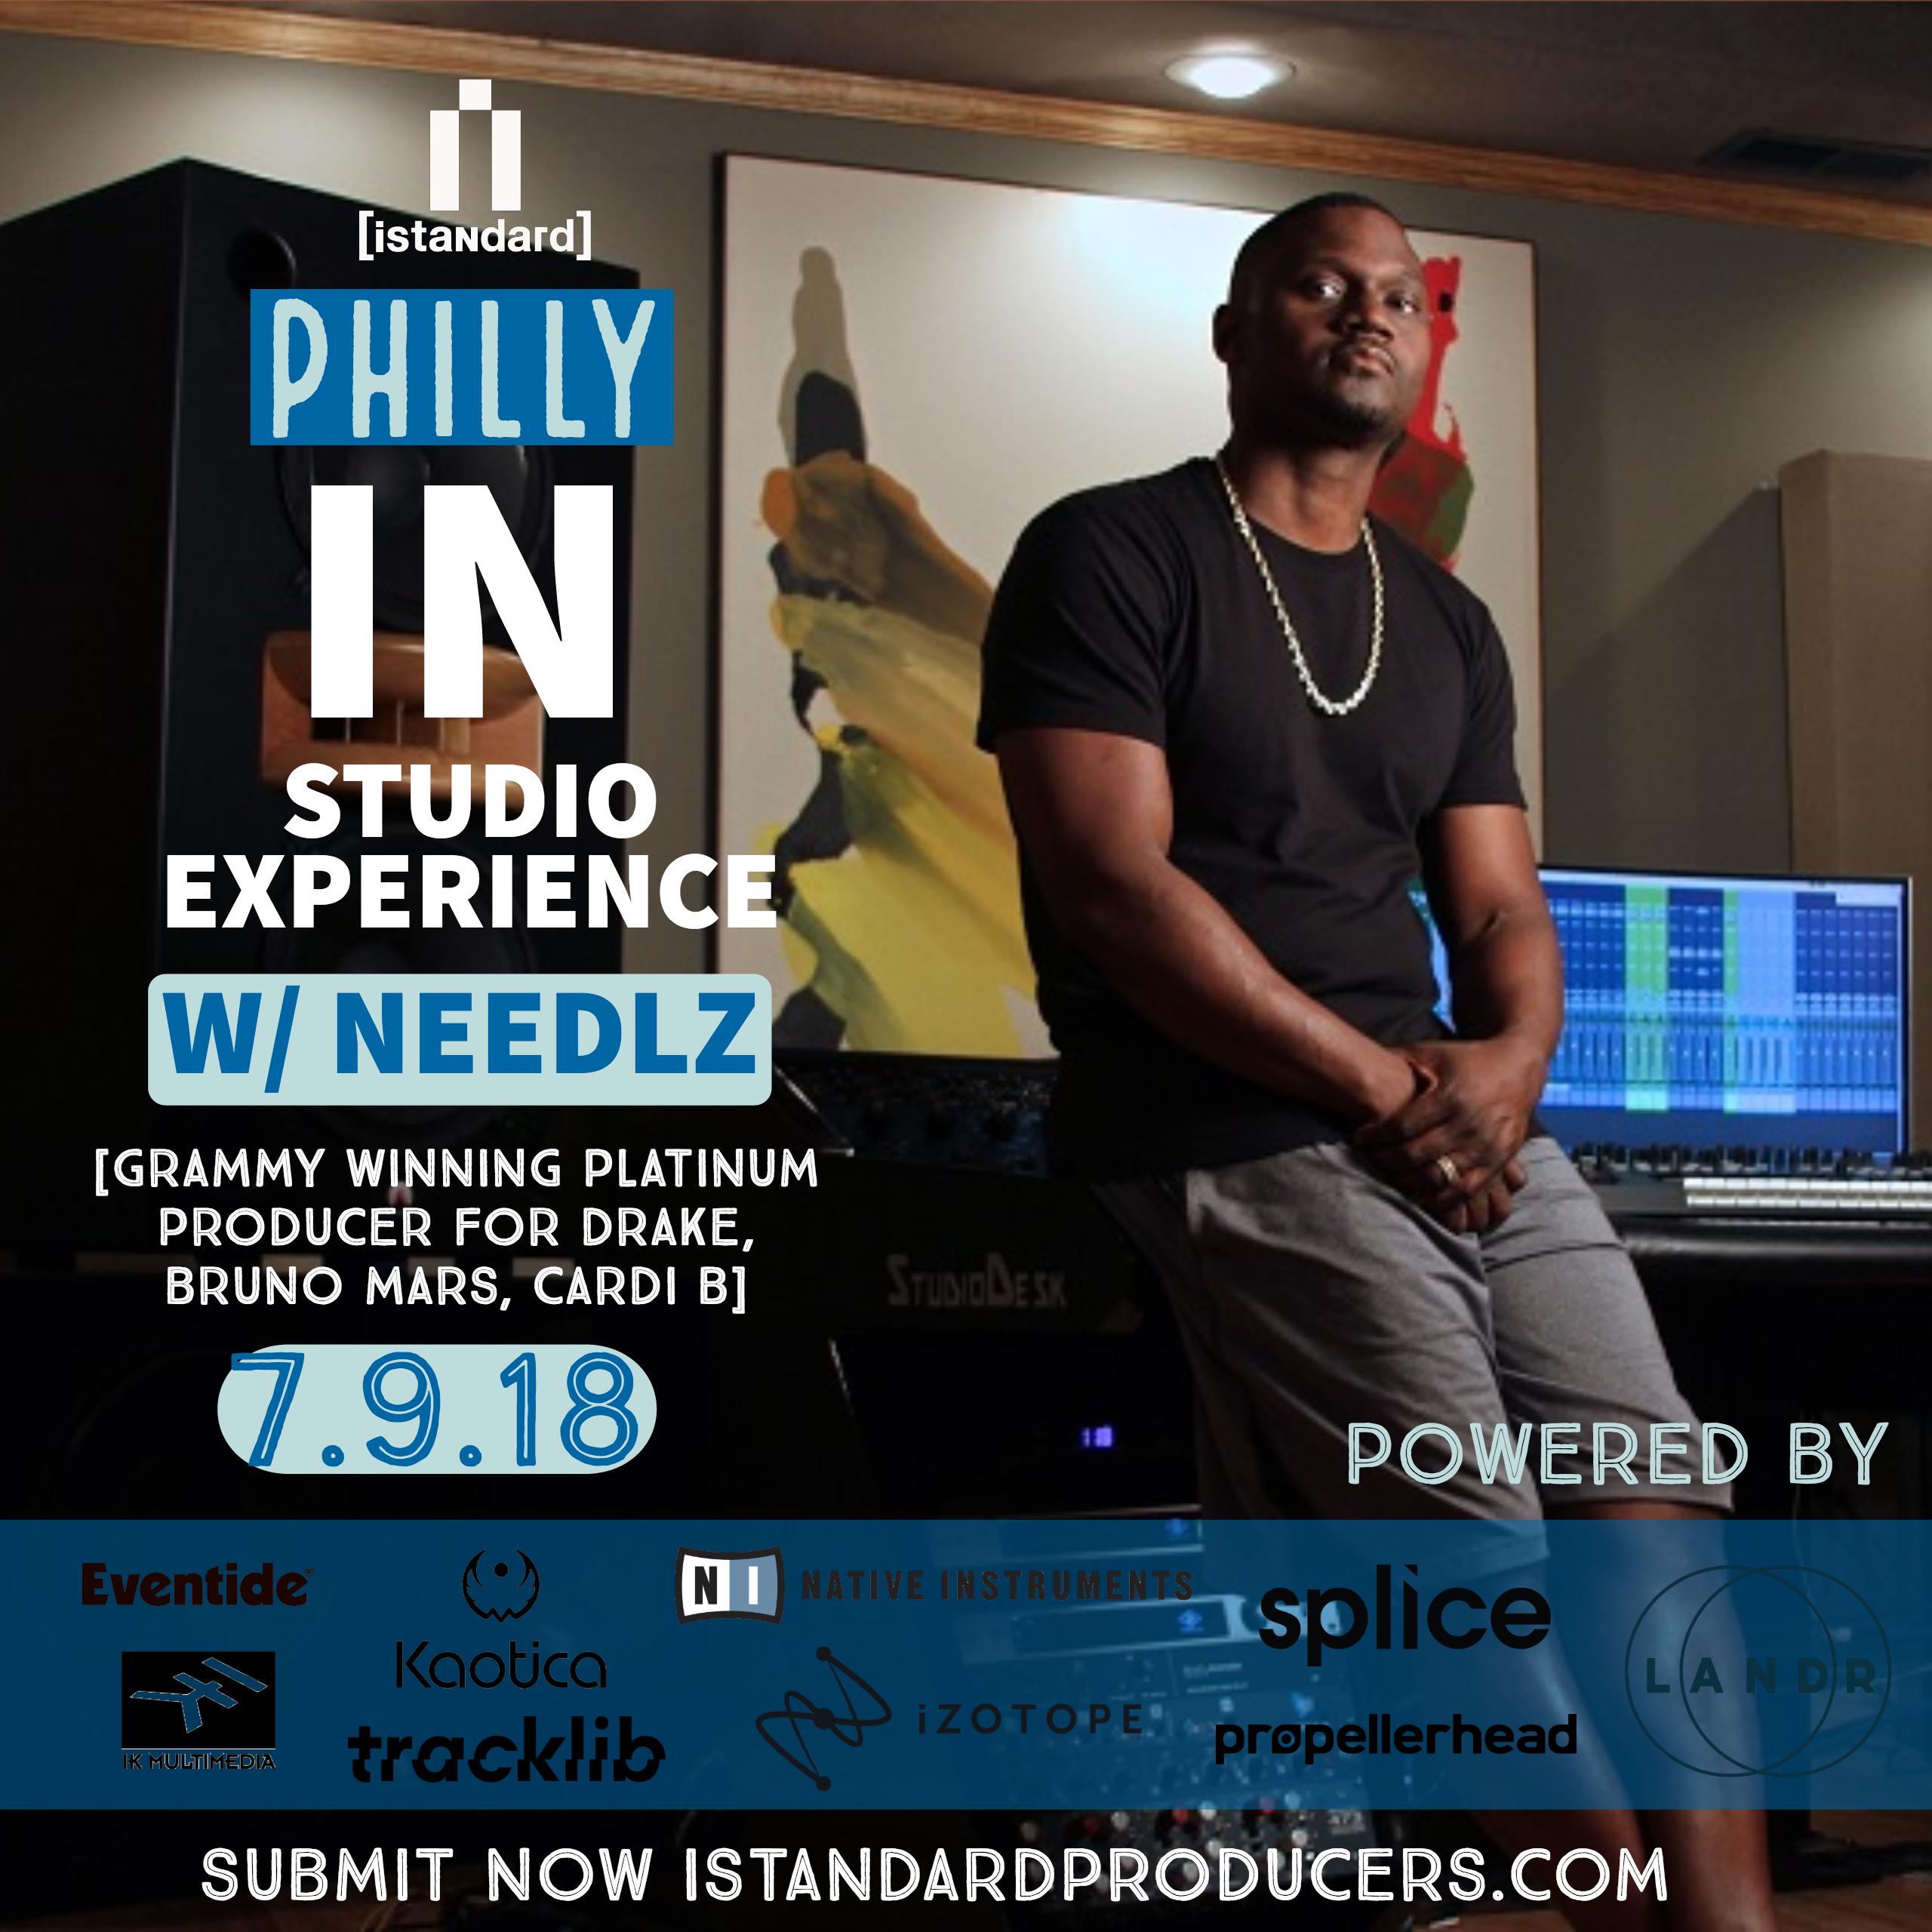 istandard in-studio experience - philadelphia] - Events